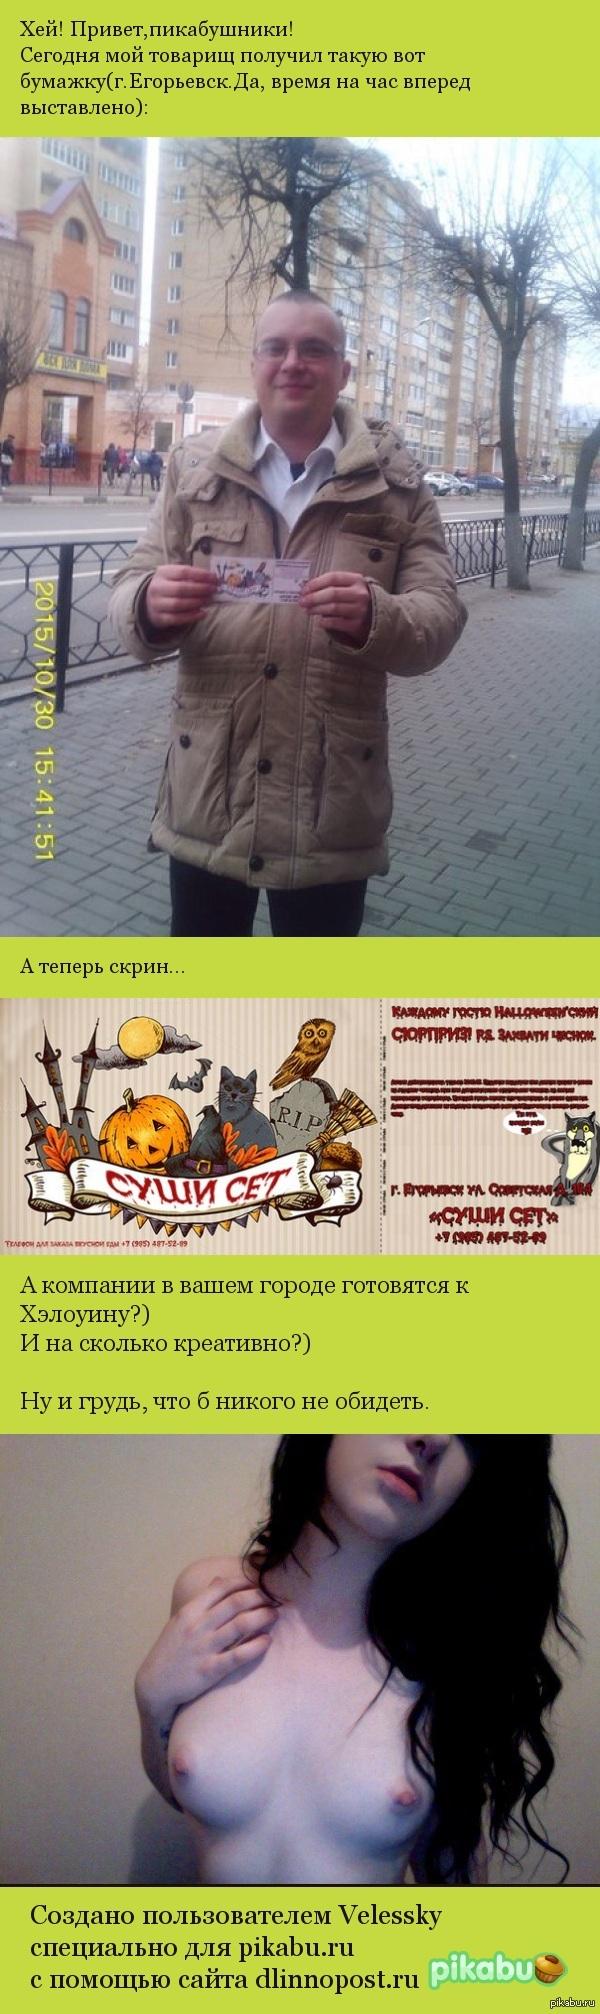 Акция к Хеллоуину.